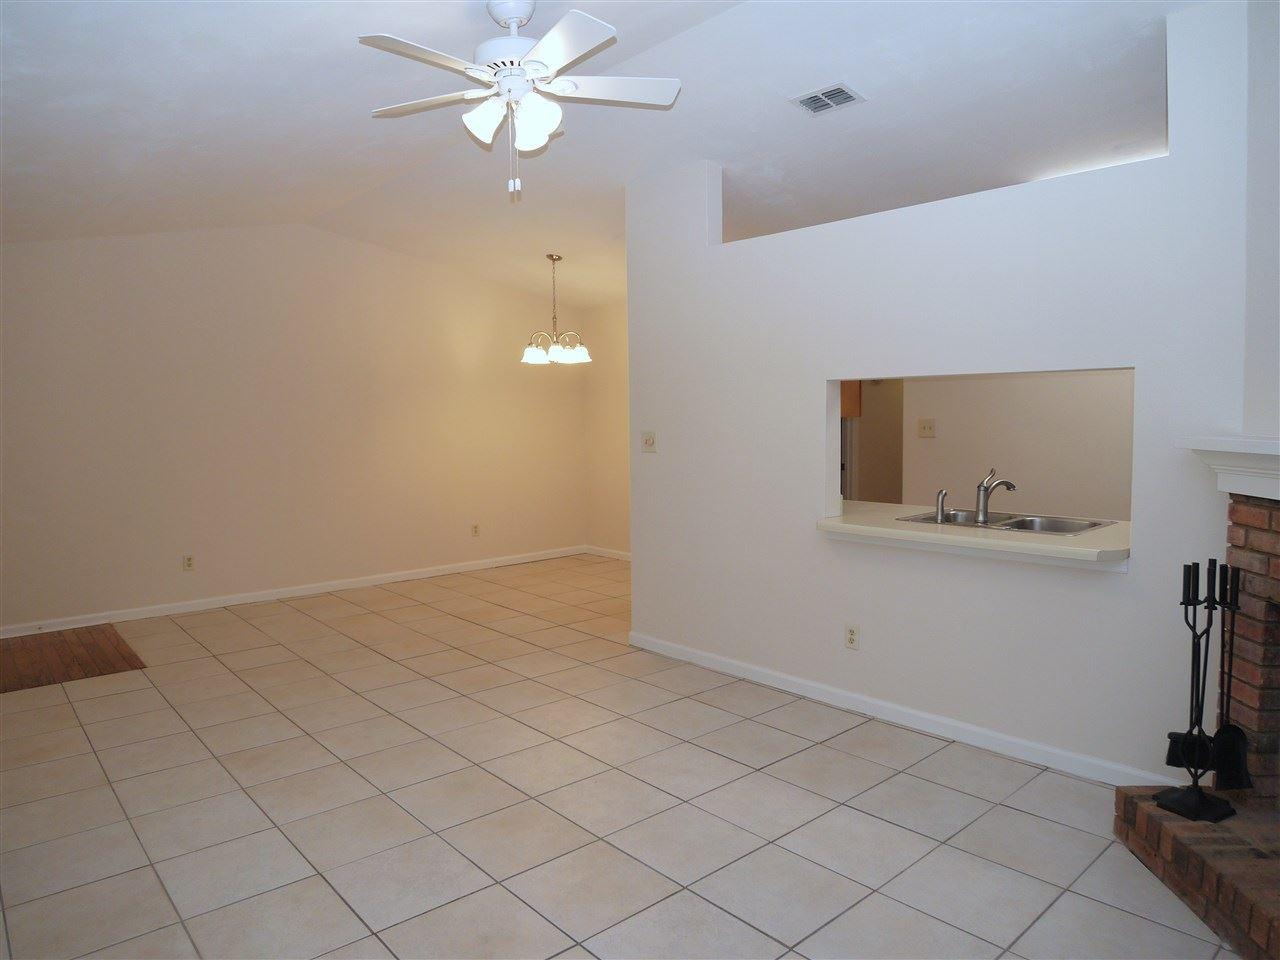 Photo of 222 Whetherbine Way, TALLAHASSEE, FL 32301 (MLS # 324142)